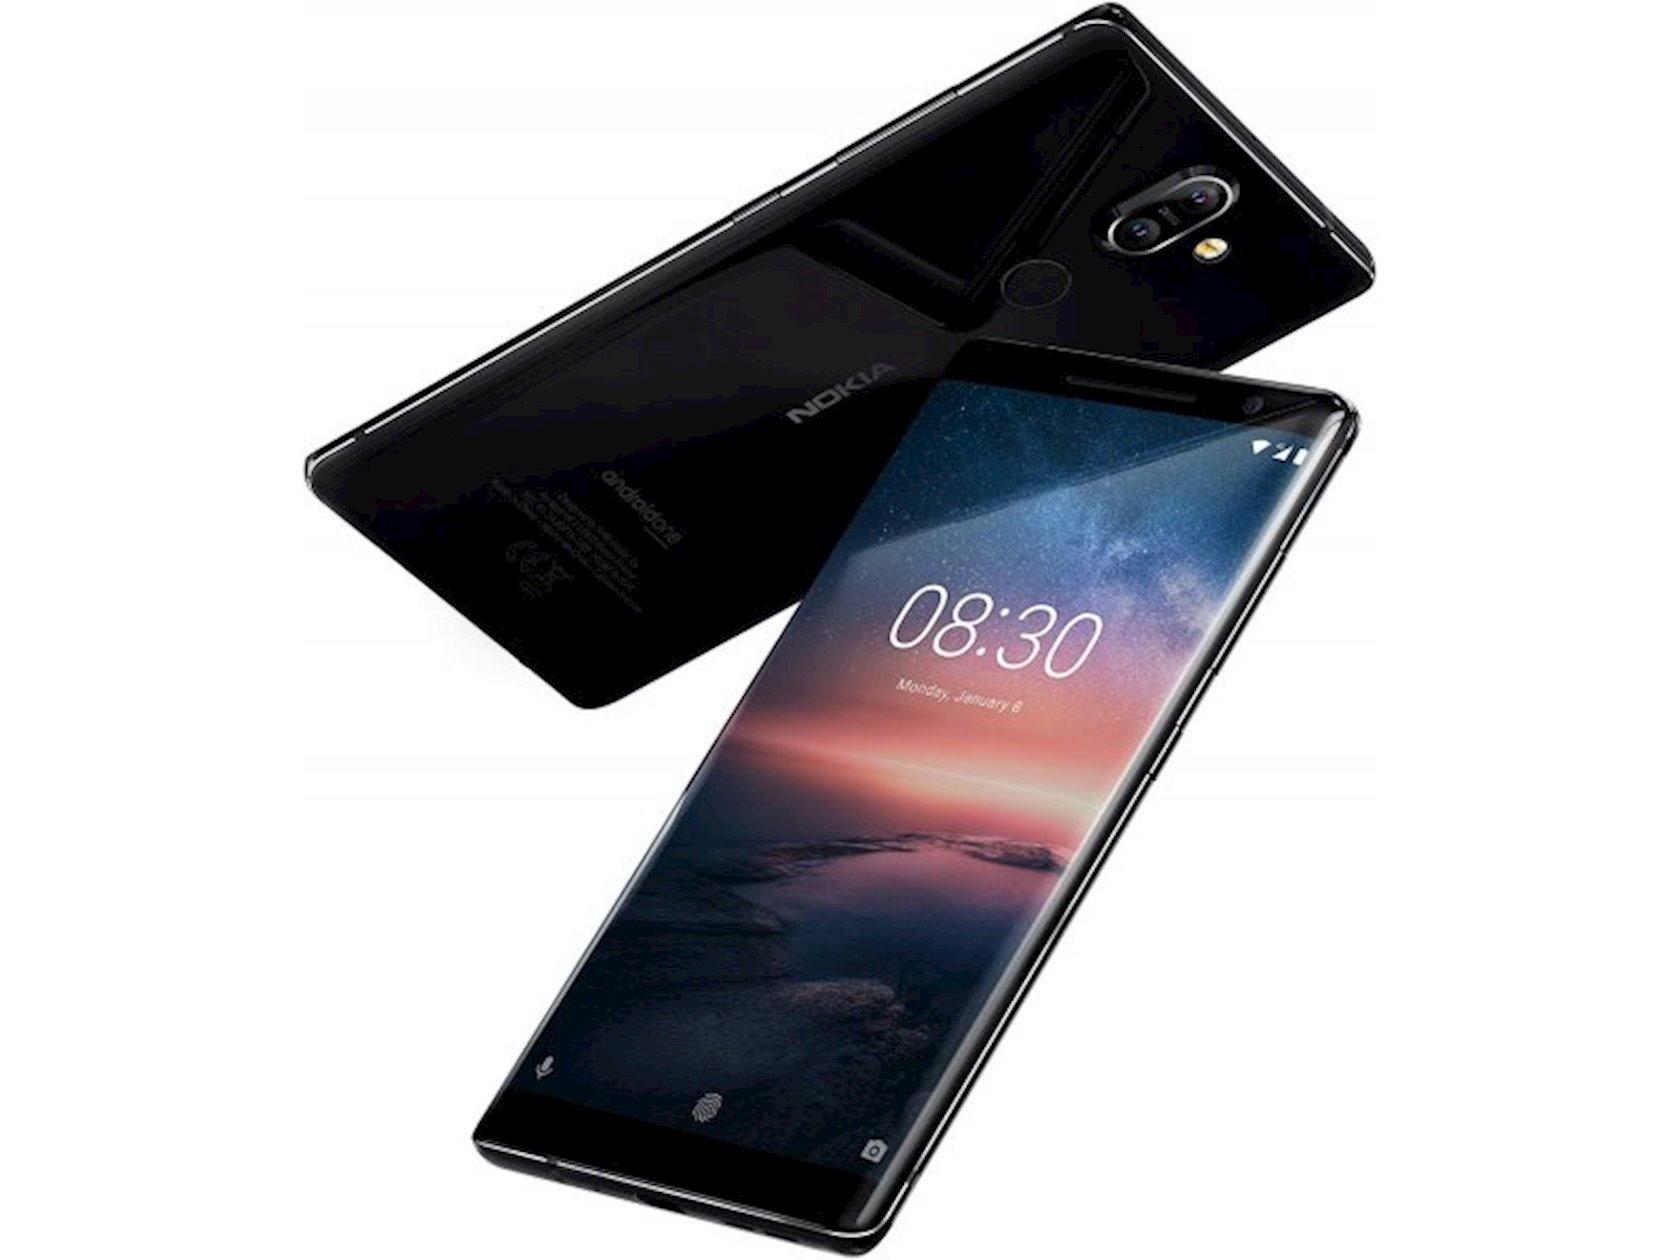 Smartfon Nokia 8 Sirocco 6GB/128GB Black